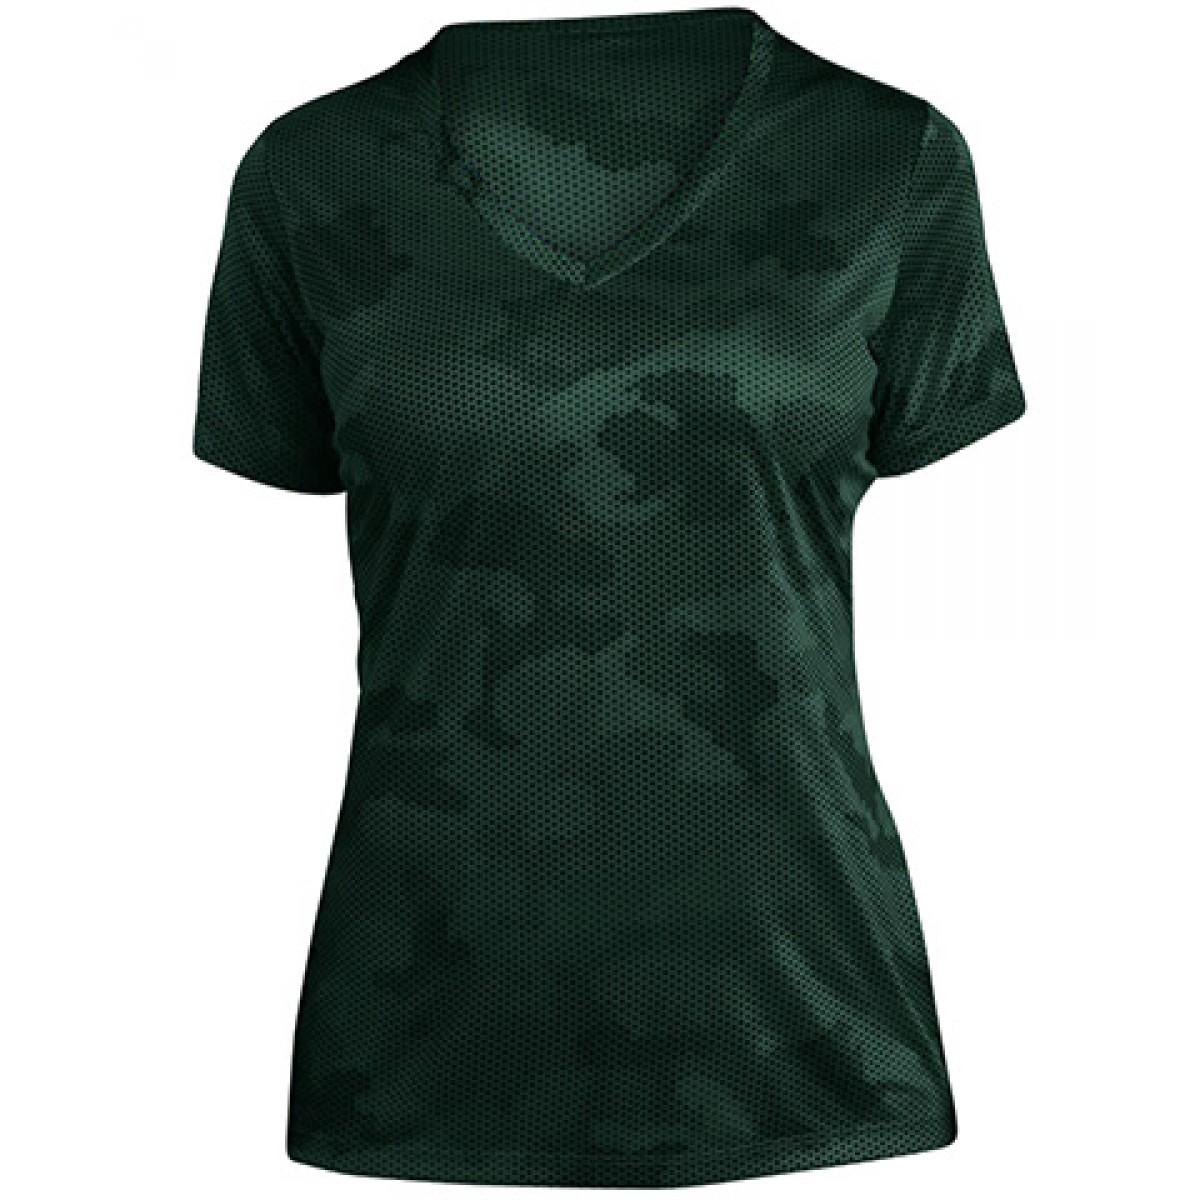 Ladies CamoHex V-Neck Tee-Green-2XL